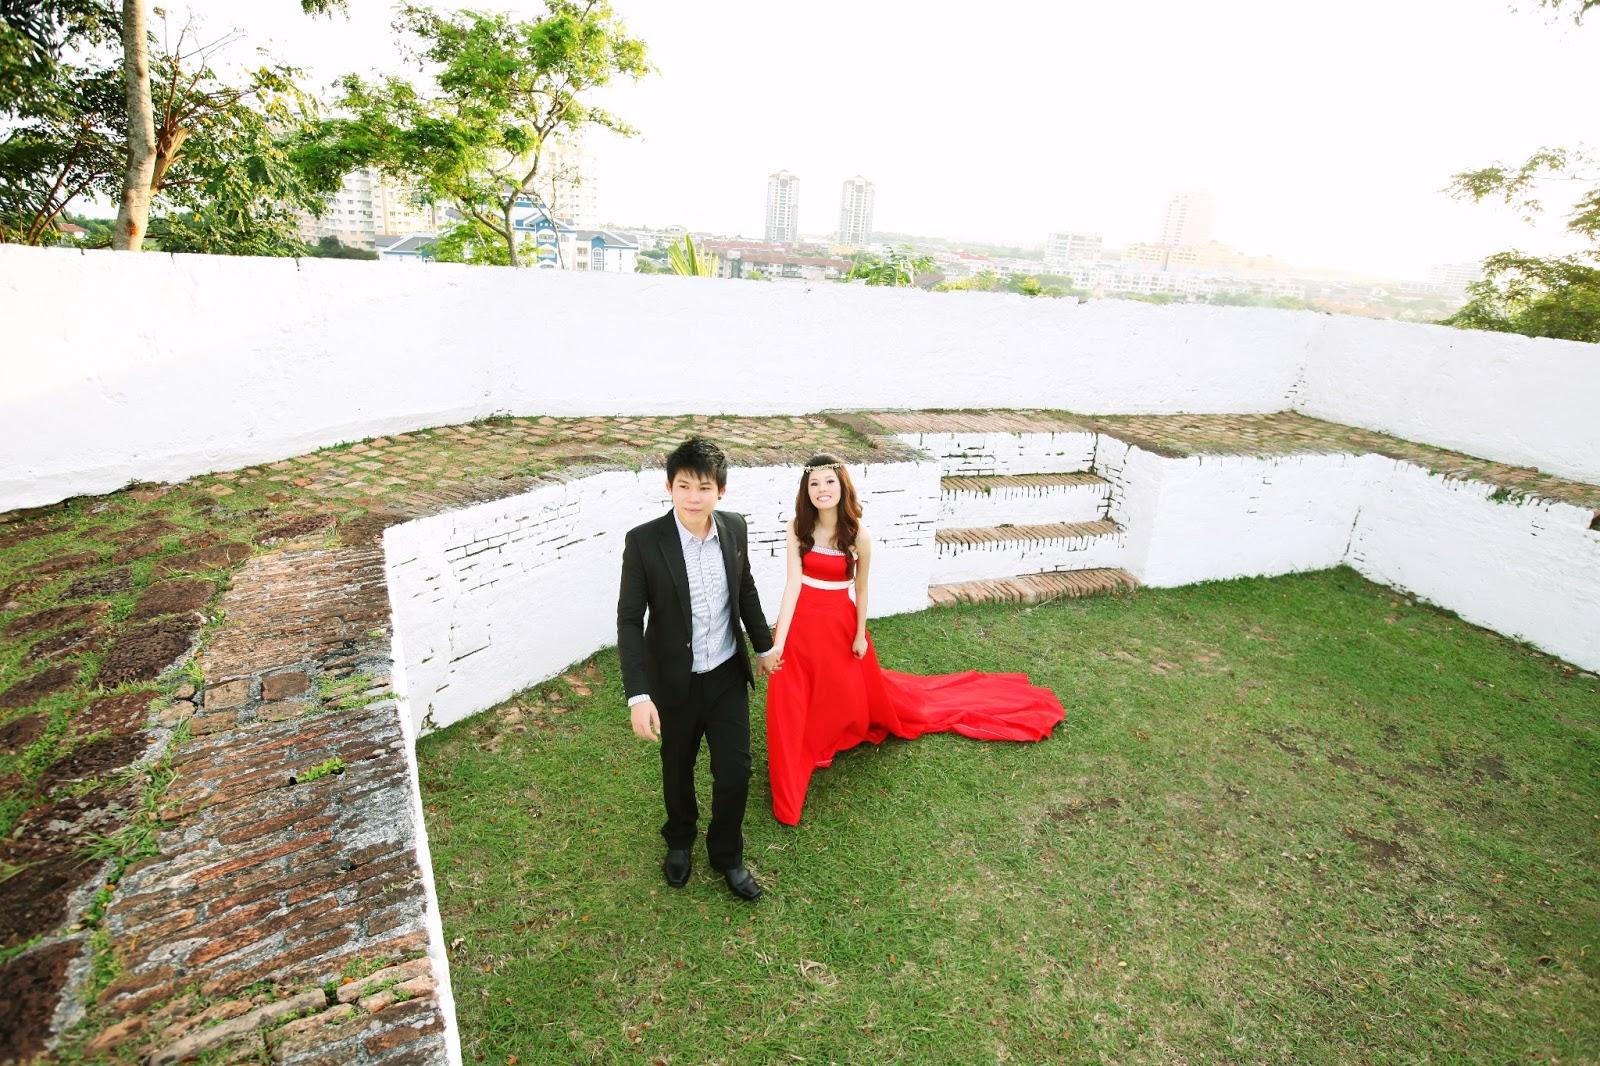 Sweeticous Ƹ̵̡Ӝ̵̨̄Ʒ: Time To Get Married